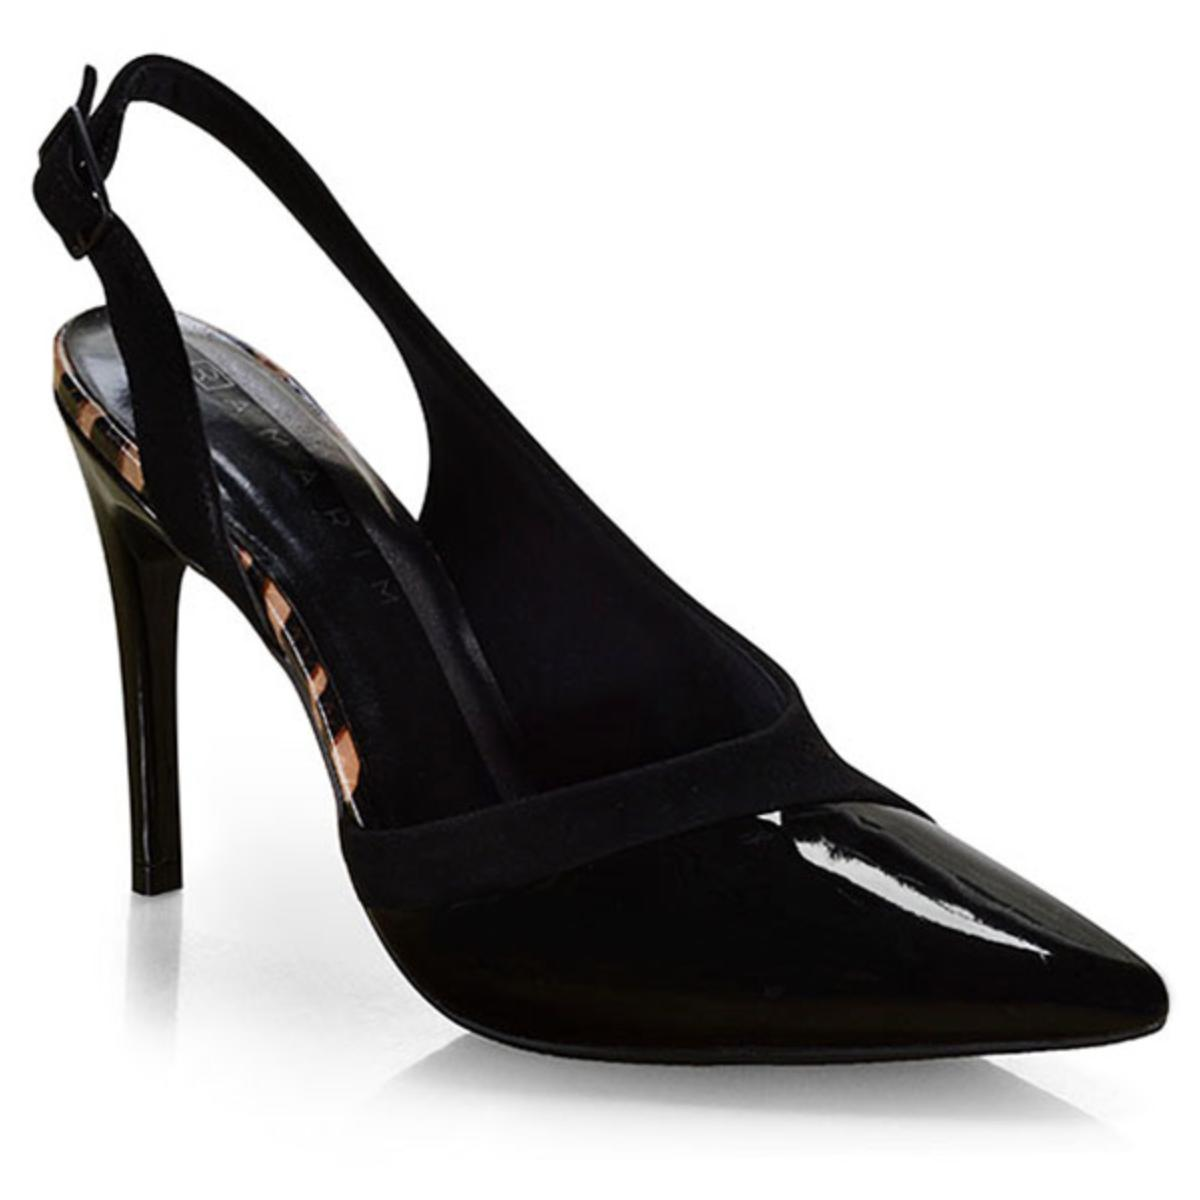 Sapato Feminino Ramarim 19-94201 Preto